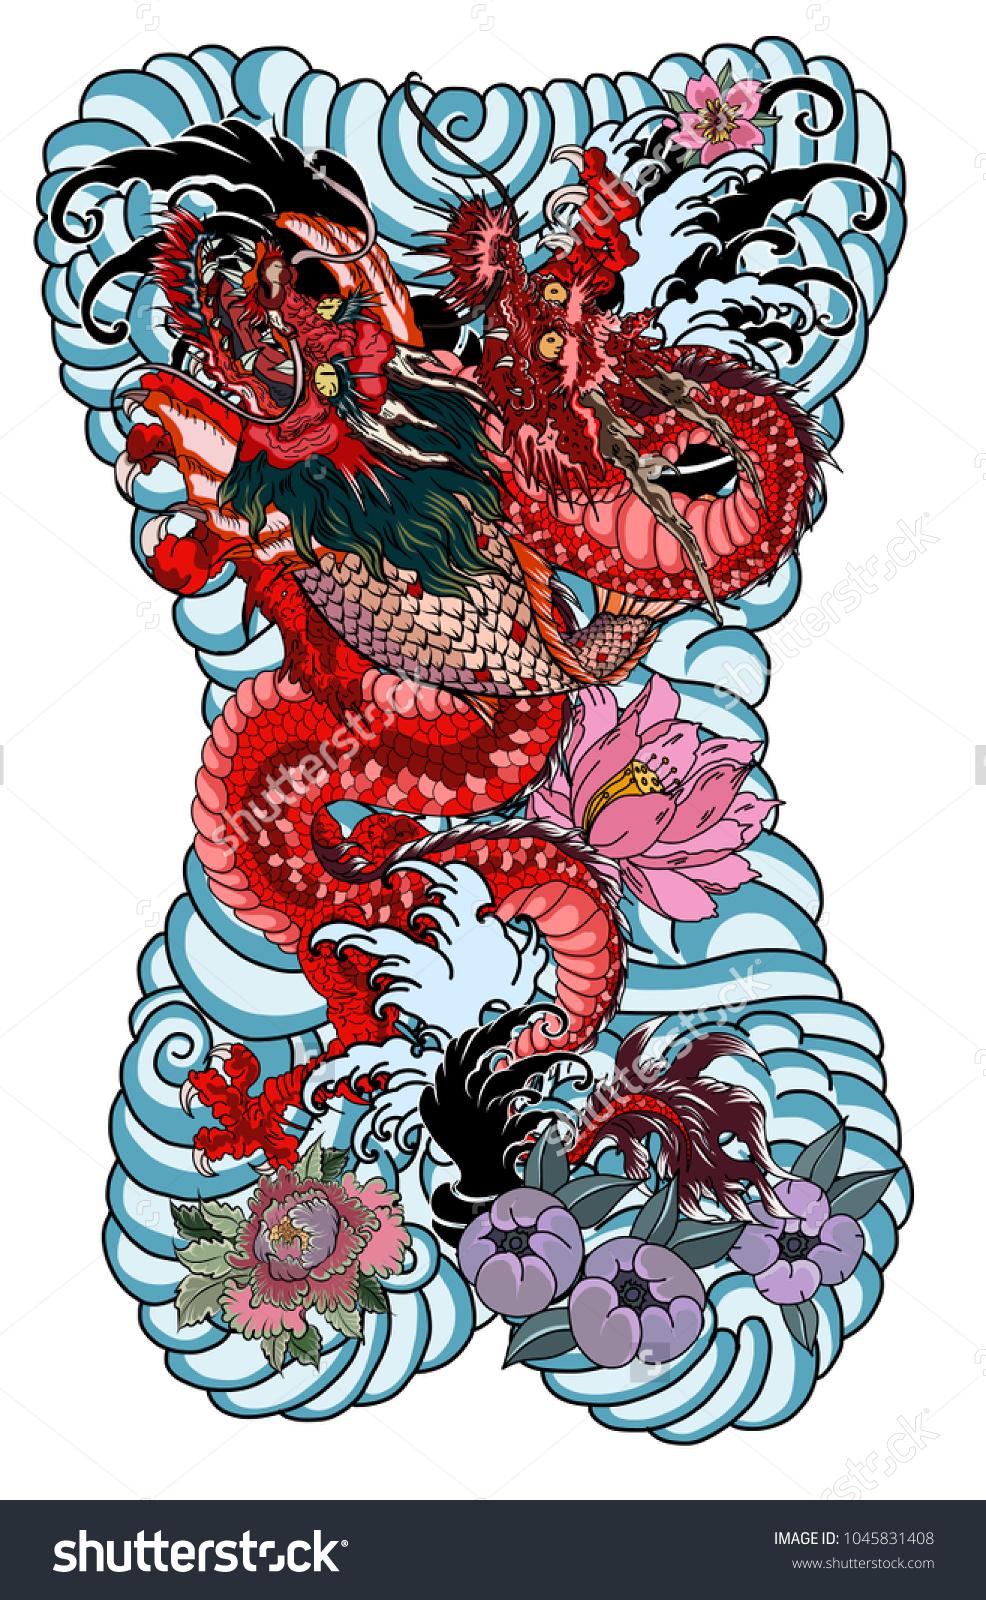 Dragon koi dragon lotus flower tattoopeach stock vector 1045831408 dragon with koi dragon and lotus flower tattooach with sakura and plum flower on izmirmasajfo